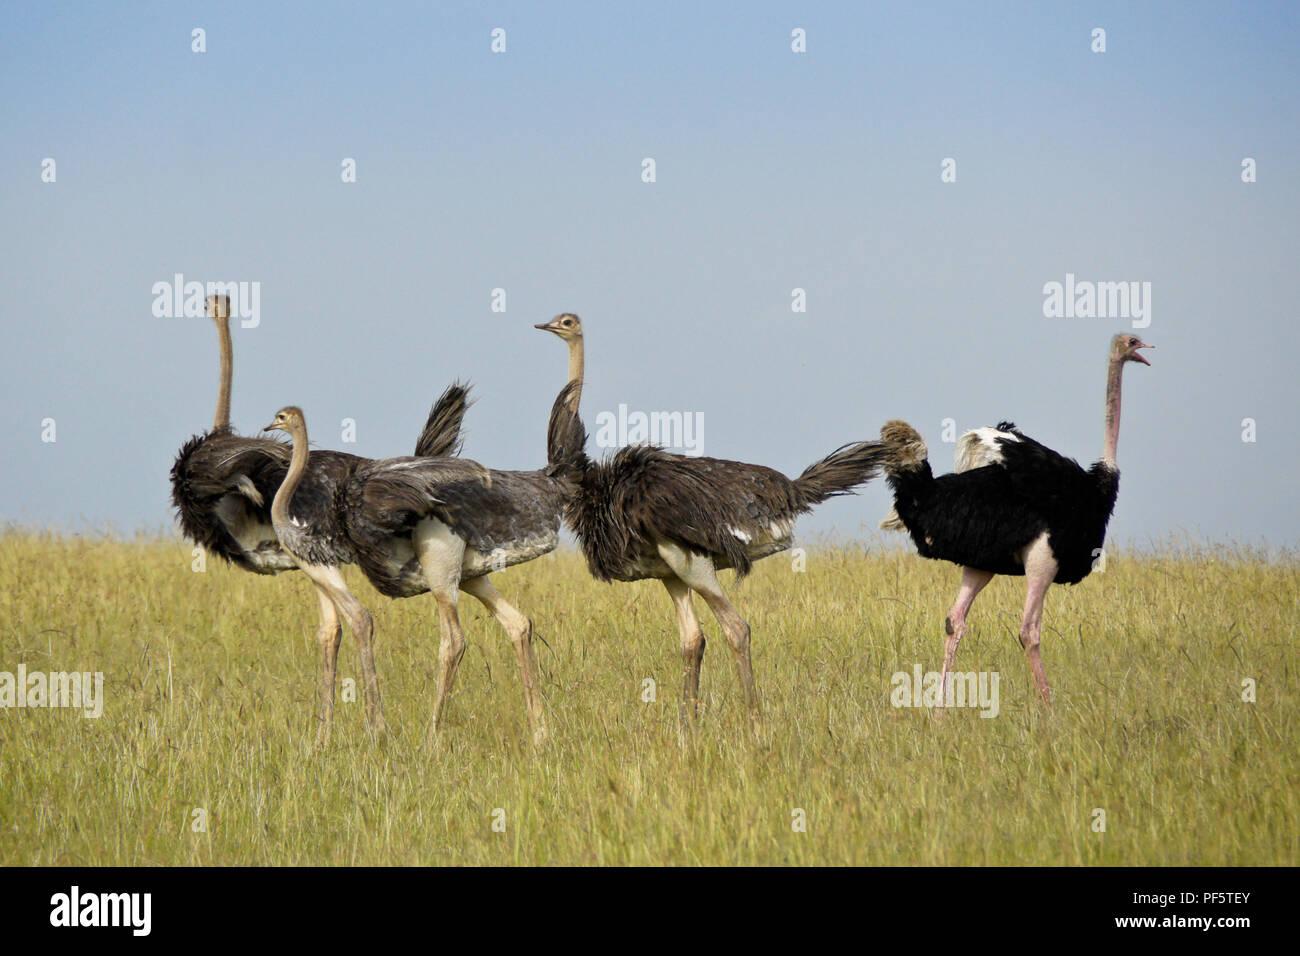 Male Masai ostrich rounding up juvenile ostriches, Masai Mara Game Reserve, Kenya - Stock Image